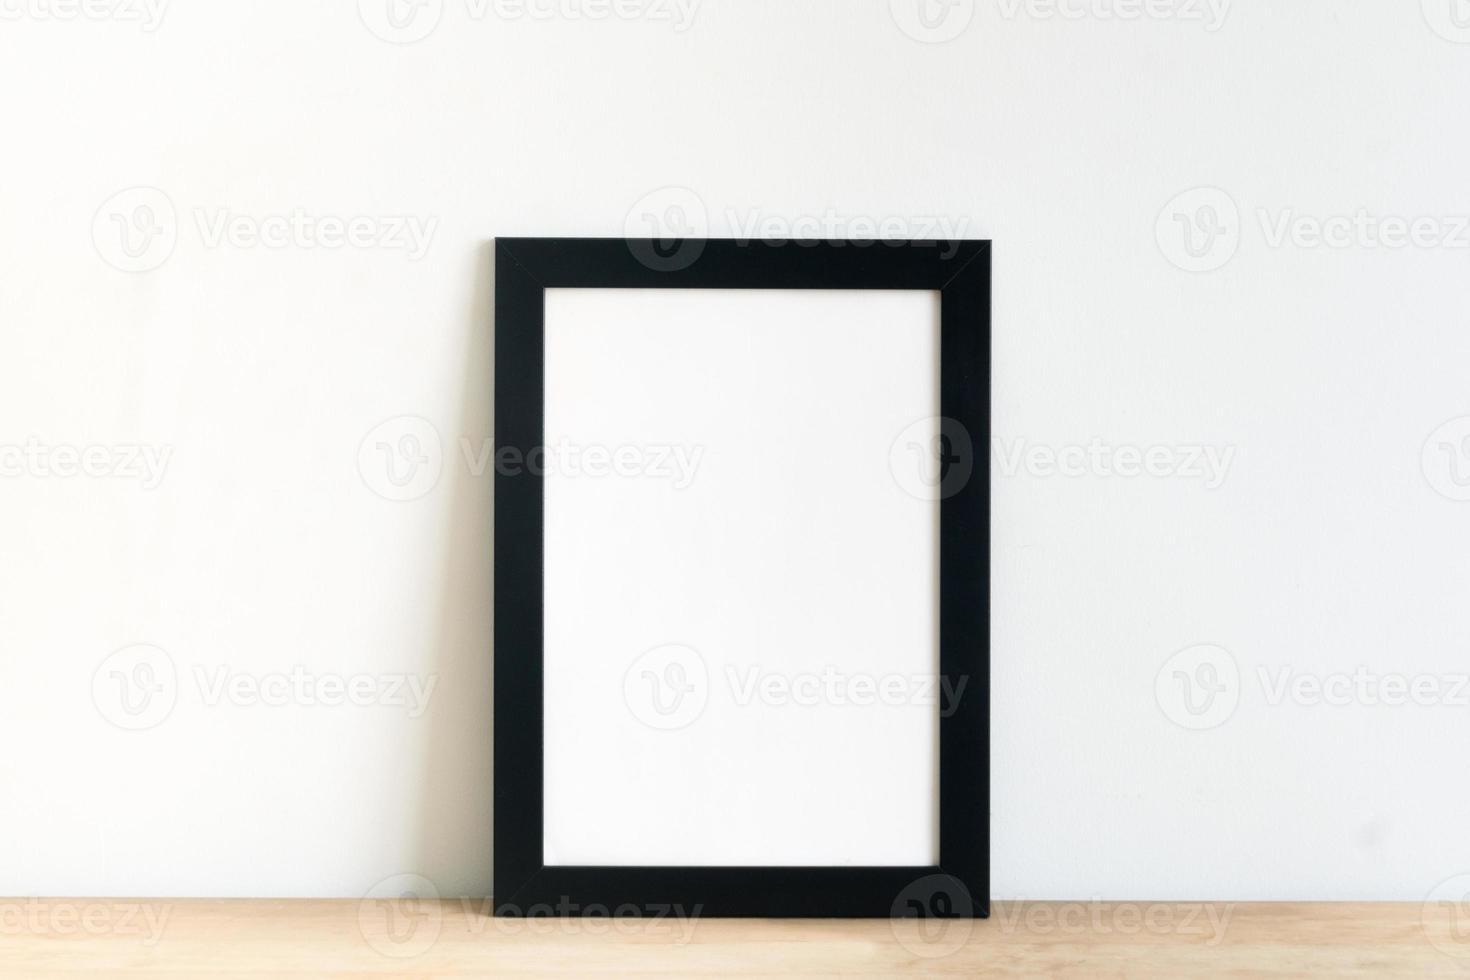 lege zwarte afbeeldingsframe op de witte interieur achtergrond foto